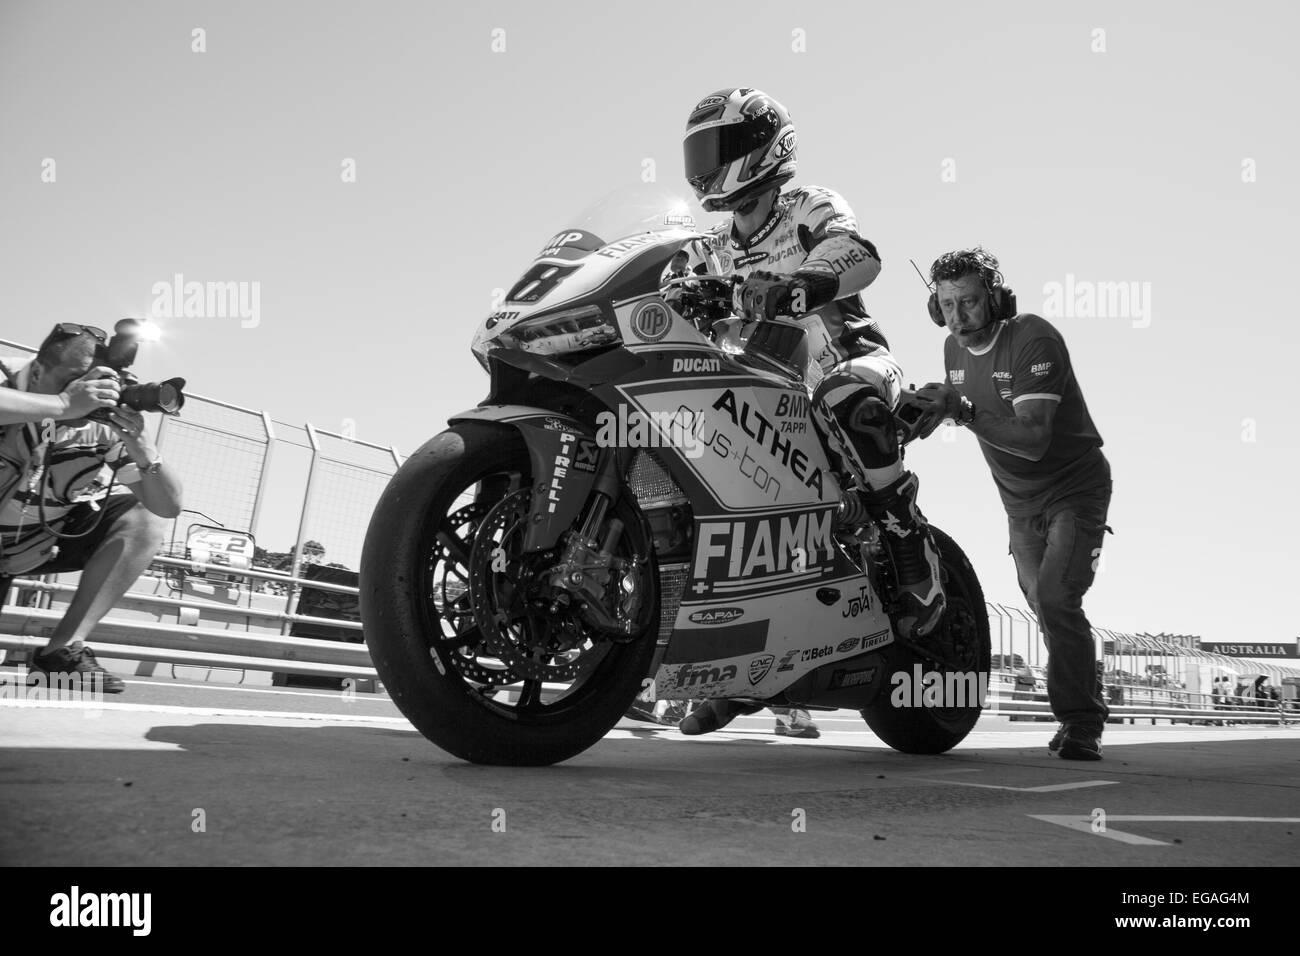 Phillip Island Grand Prix Circuit, Australia. Saturday, 21 February, 2015. Free Practice 4. Nicolas Terol heads Stock Photo